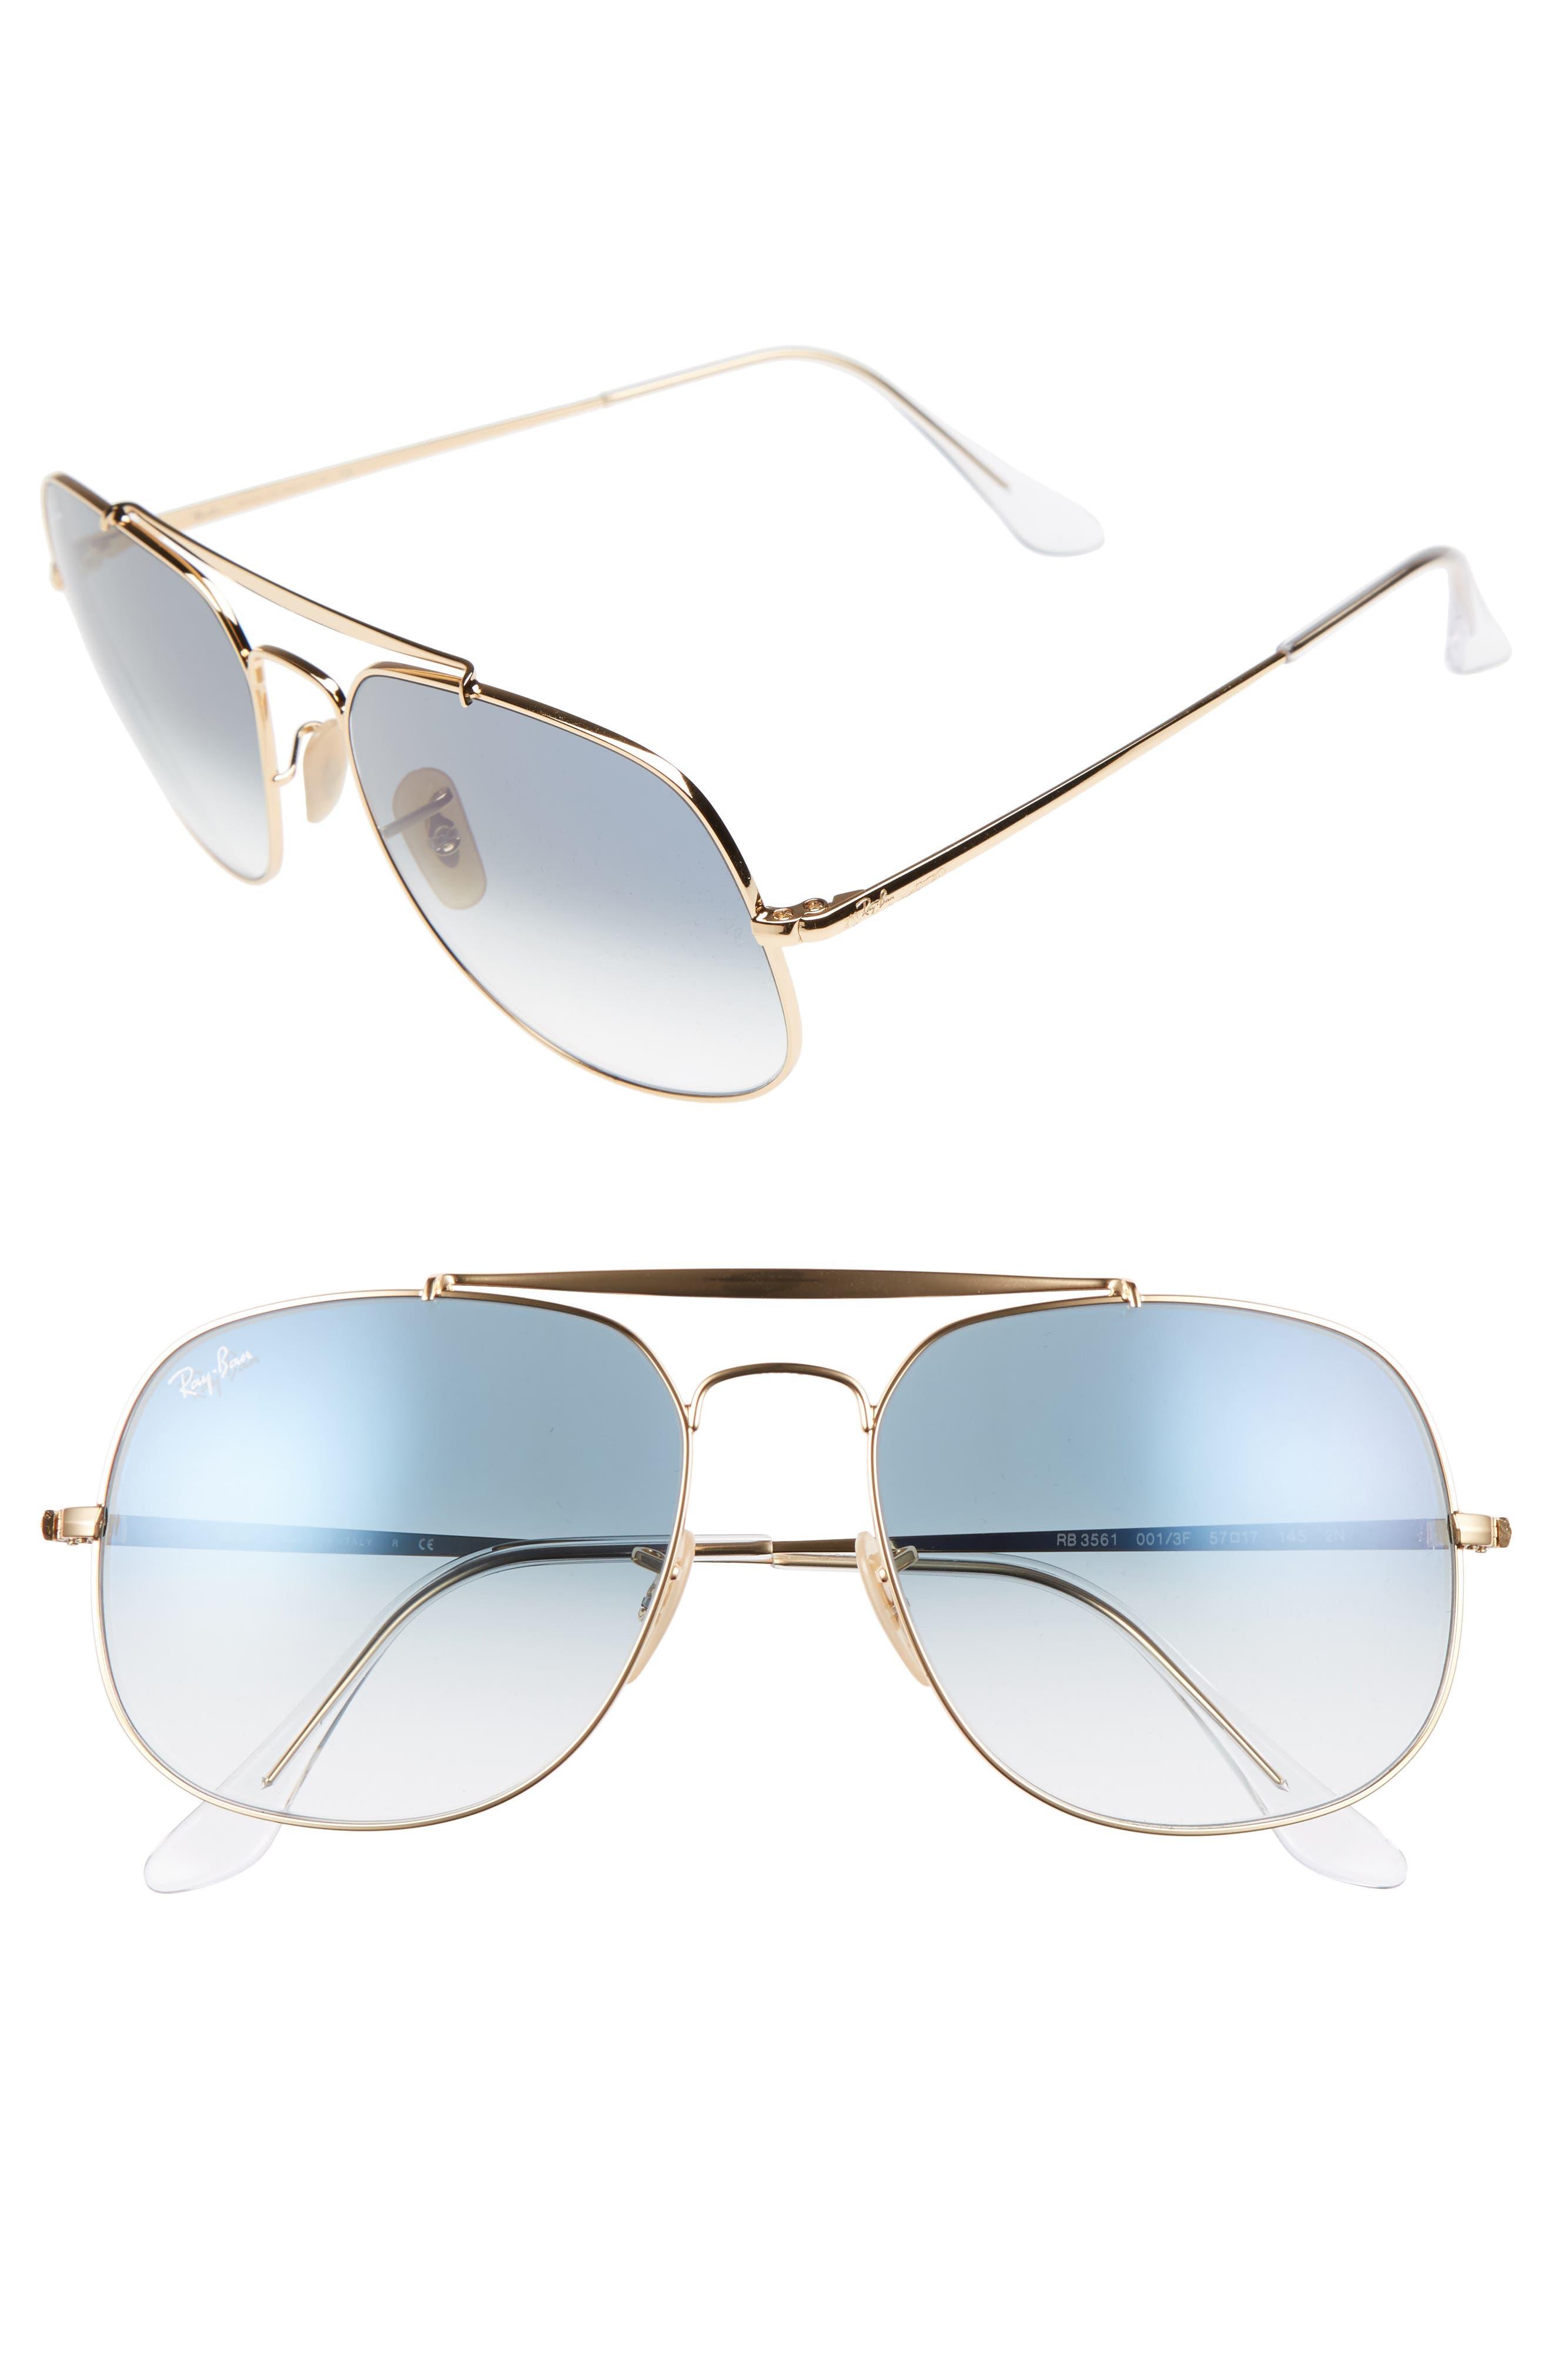 Ray-Ban 57mm Navigator Sunglasses